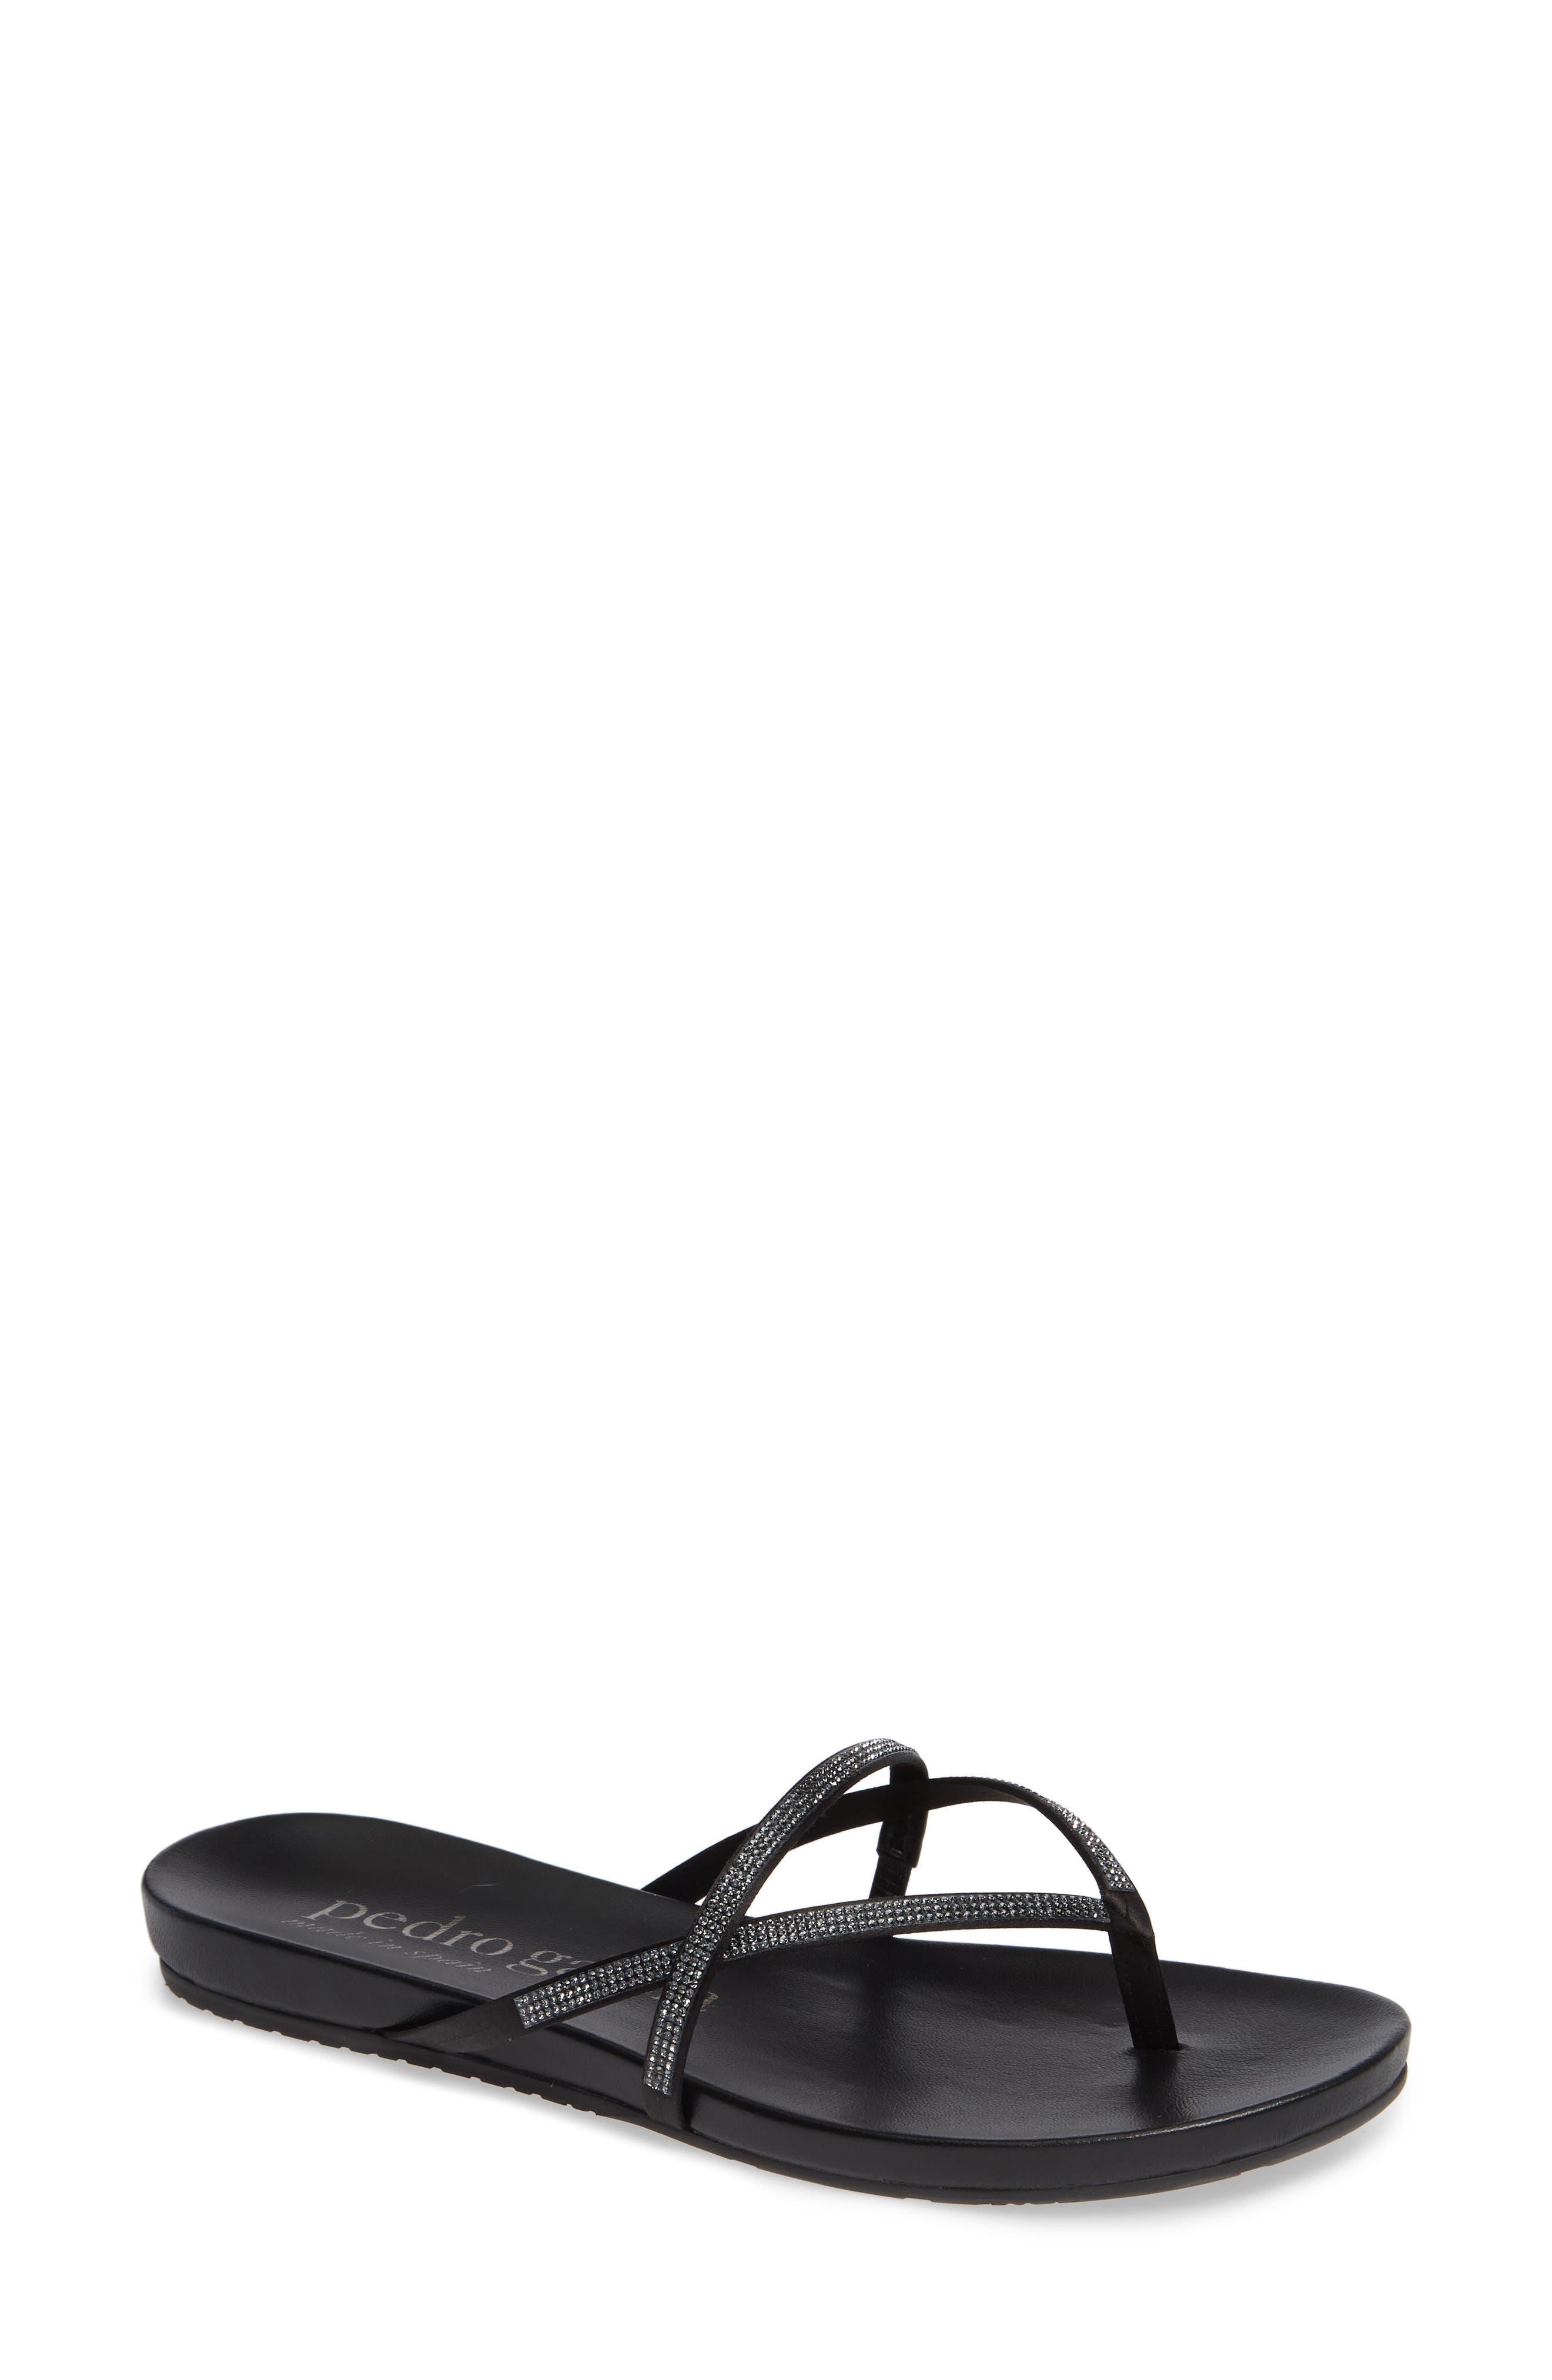 PEDRO GARCIA, Giulia Crystal Embellished Sandal, Main thumbnail 1, color, METEORITE SATIN